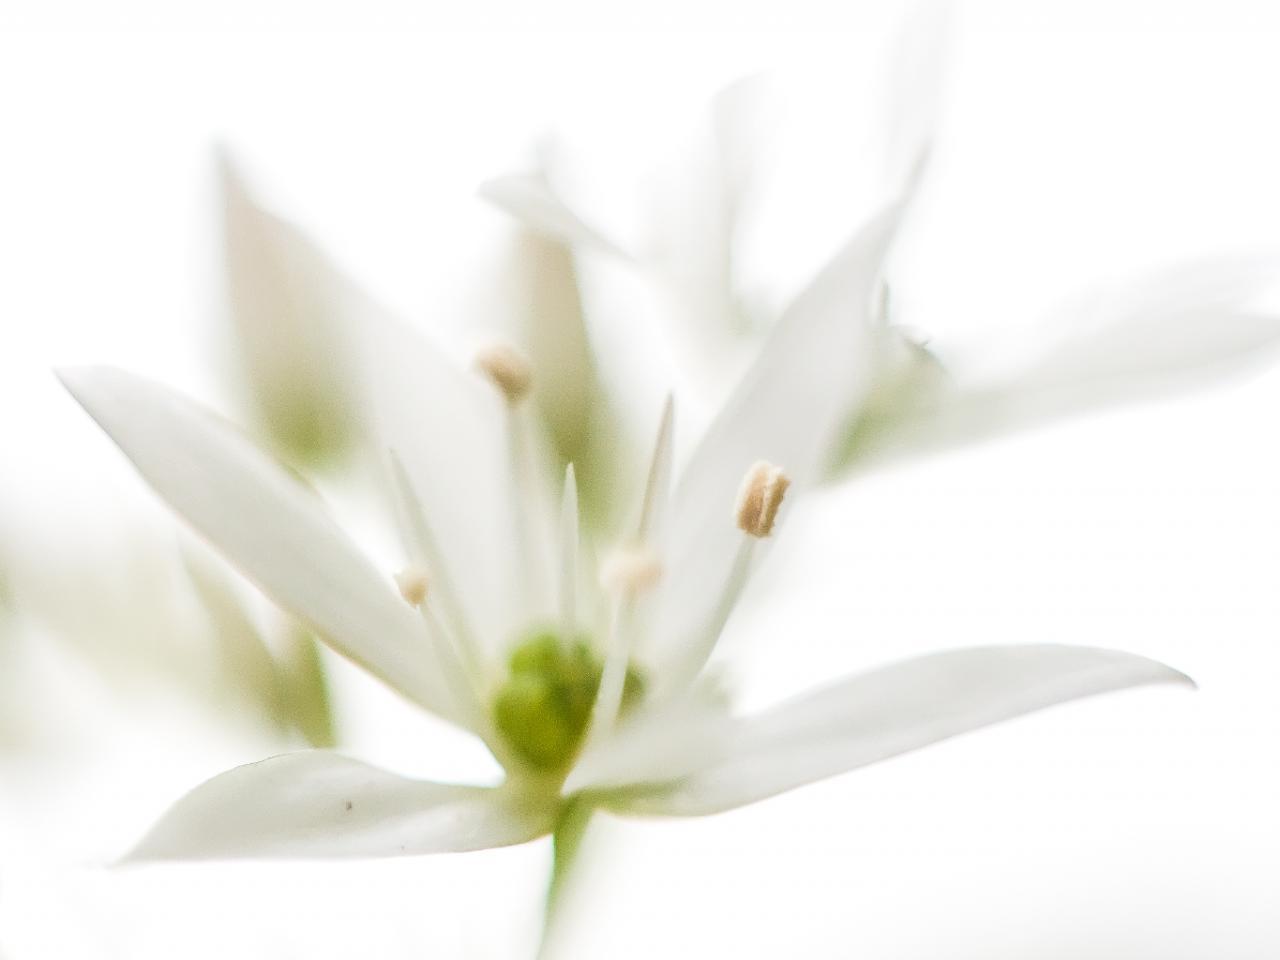 Symphonie en sol fleuri, par Francine Koeller